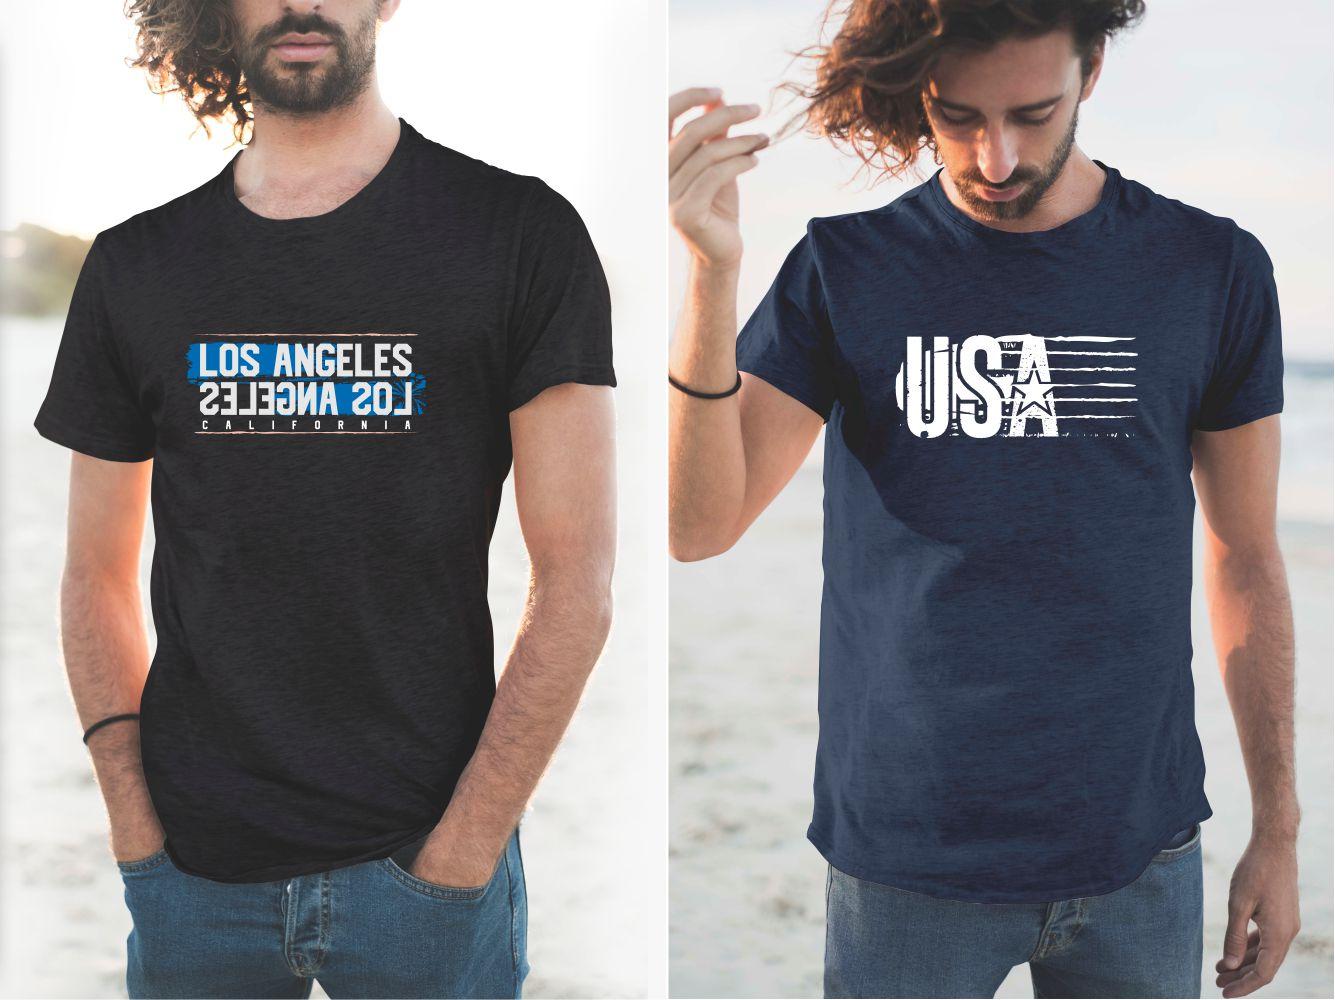 106 Urban T-shirt Designs Collection - 22 1